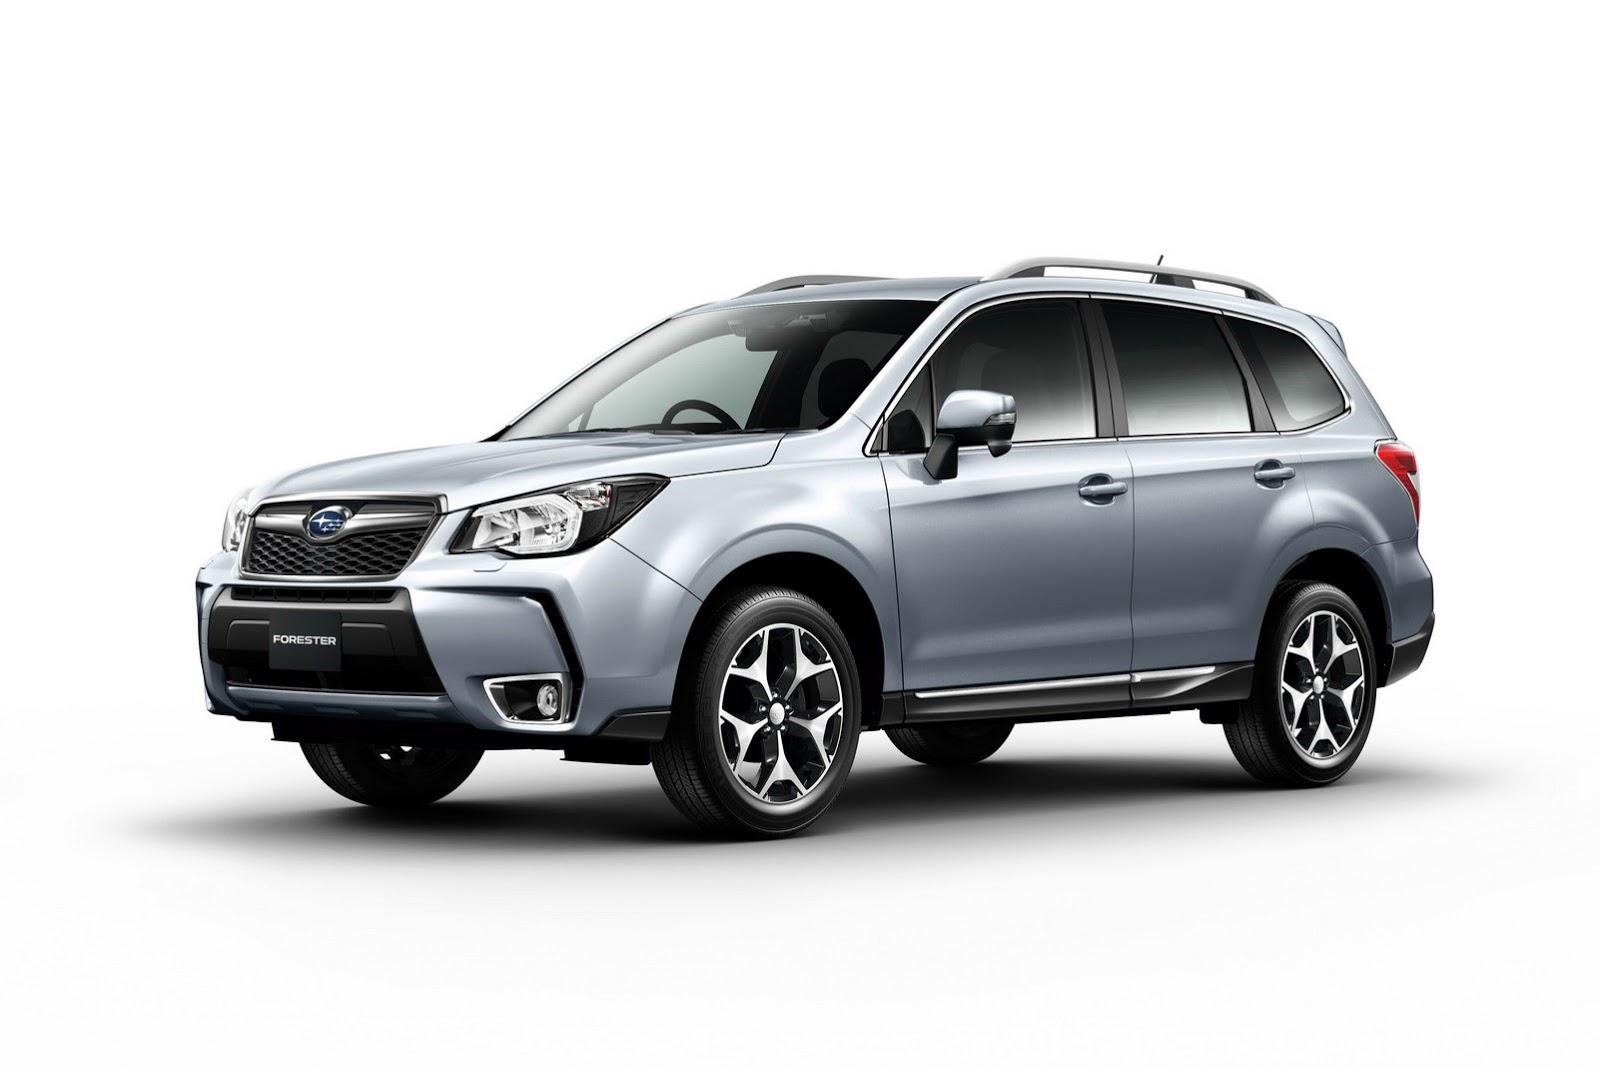 2014-Subaru-Forester_27531